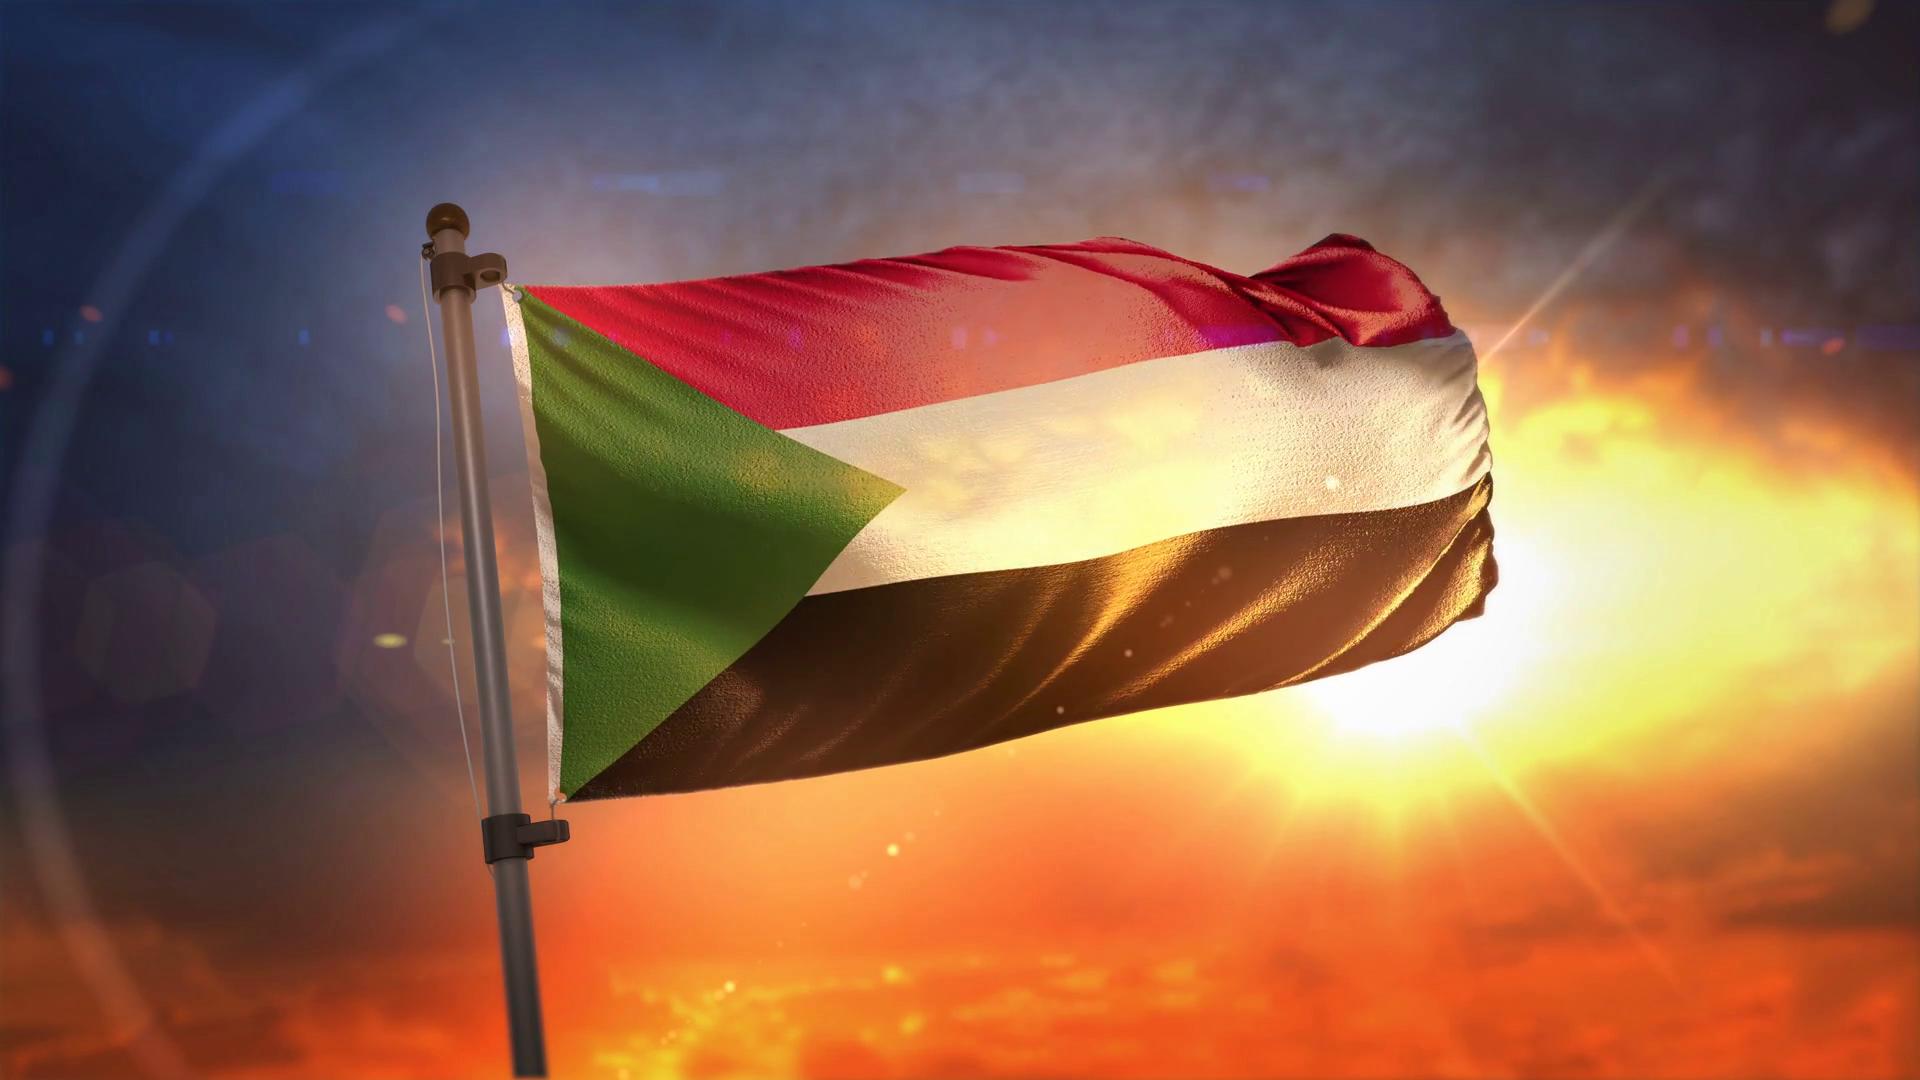 videoblocks-sudan-flag-backlit-at-beautiful-sunrise-loop-slow-motion-4k_blx8kr6-w_thumbnail-full04.png